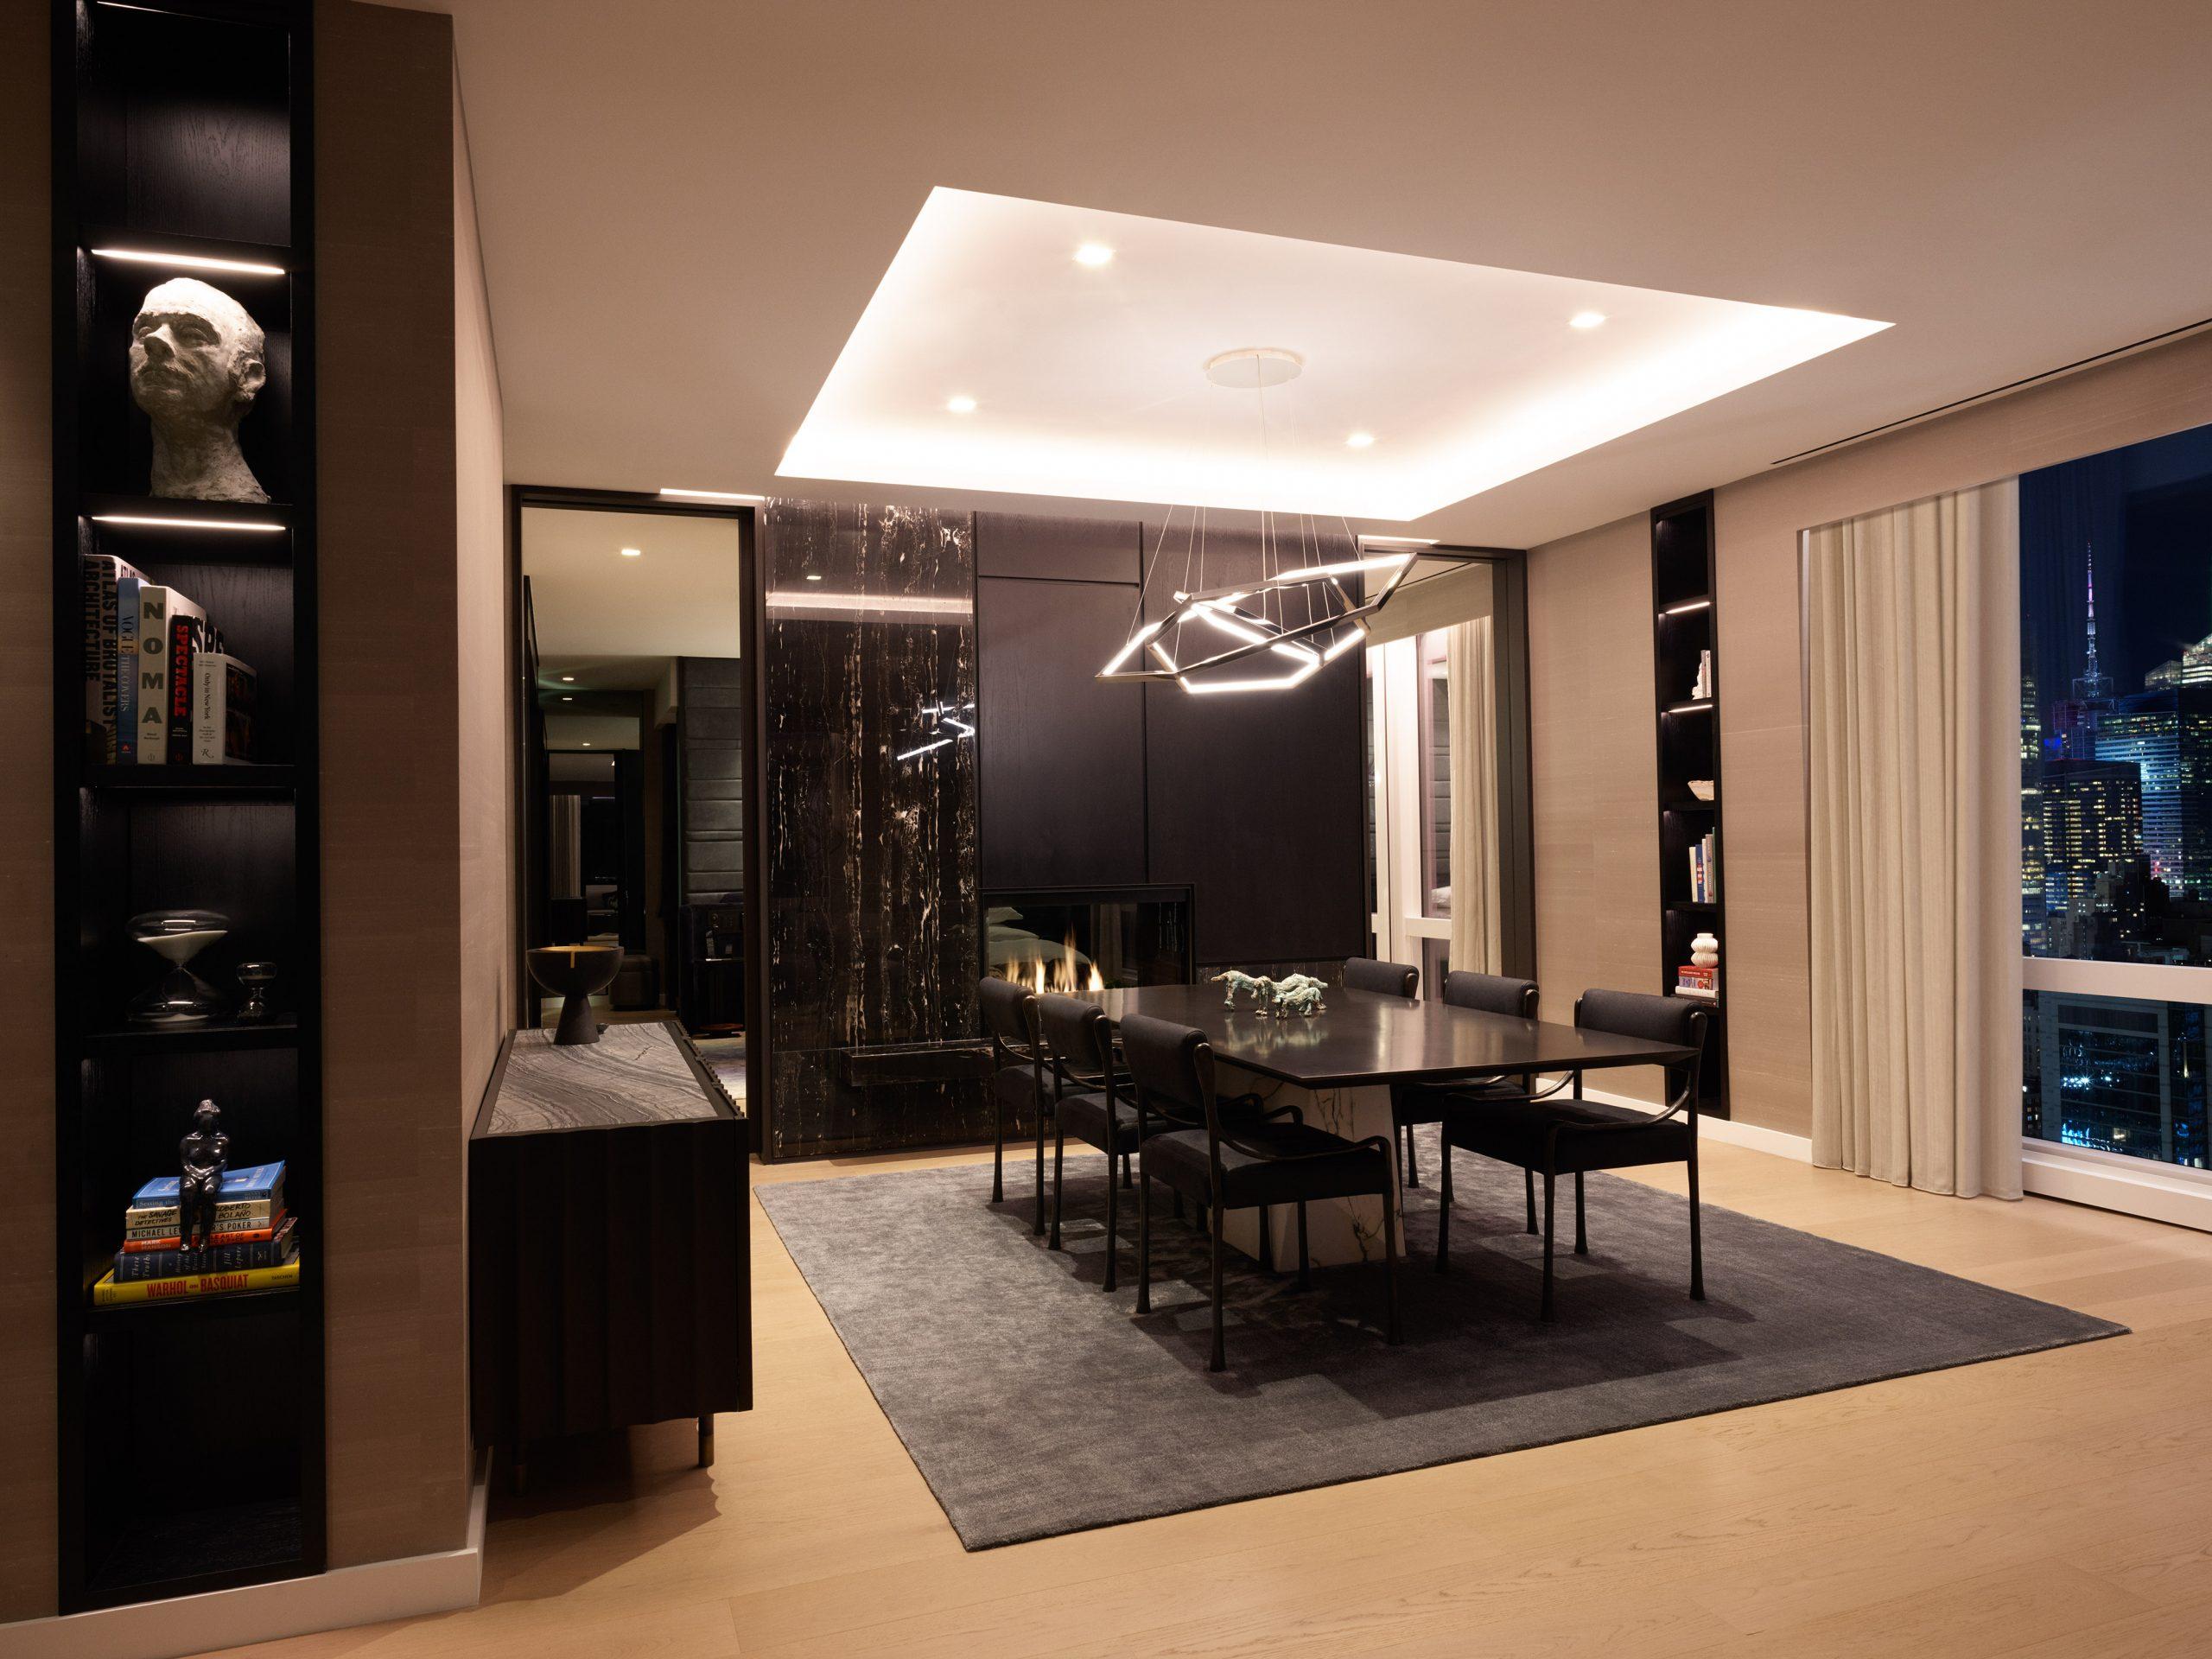 equinox suite dining room